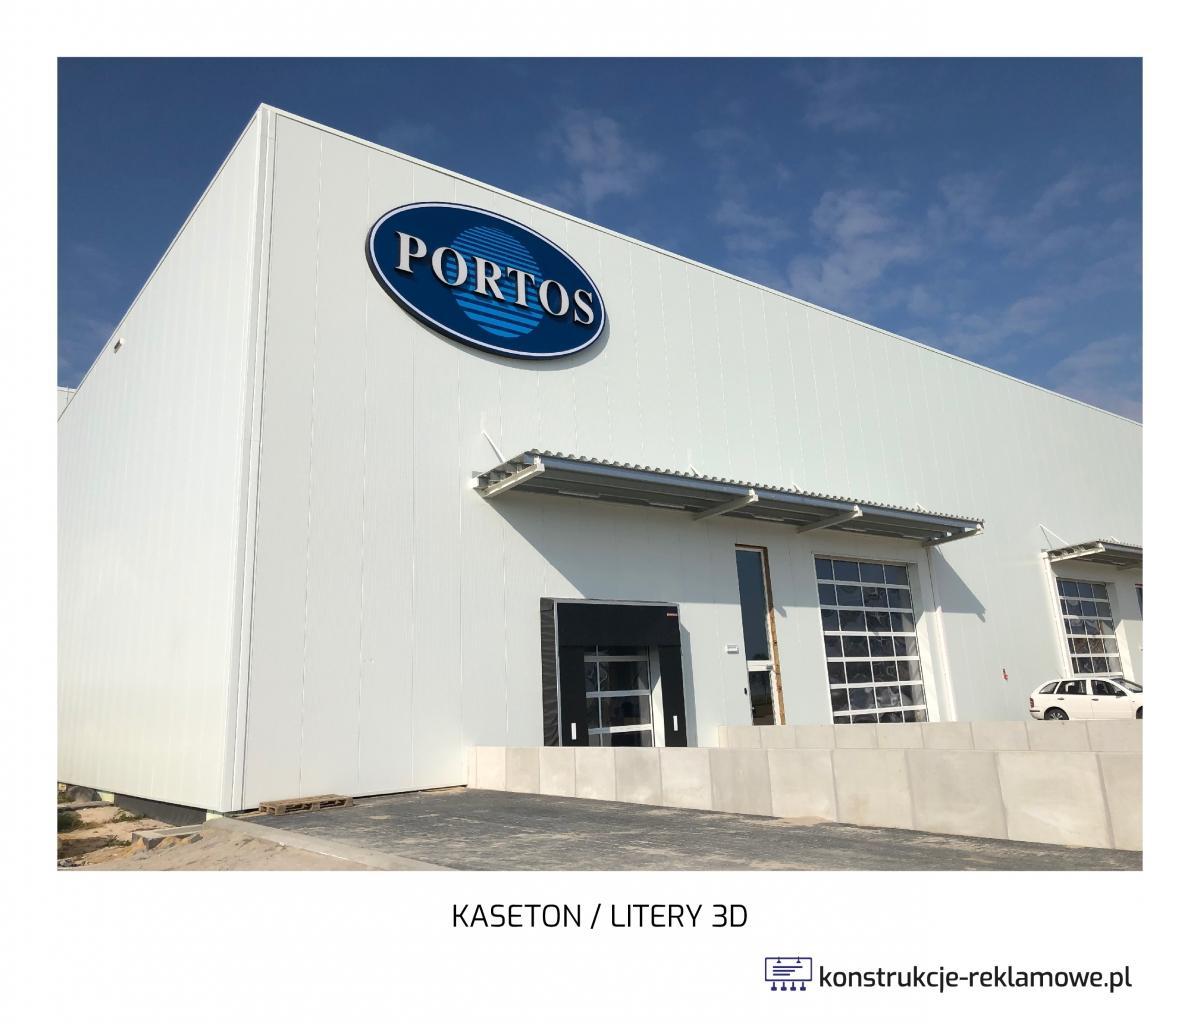 Kaseton / Litery 3D - konstrukcje-reklamowe.pl